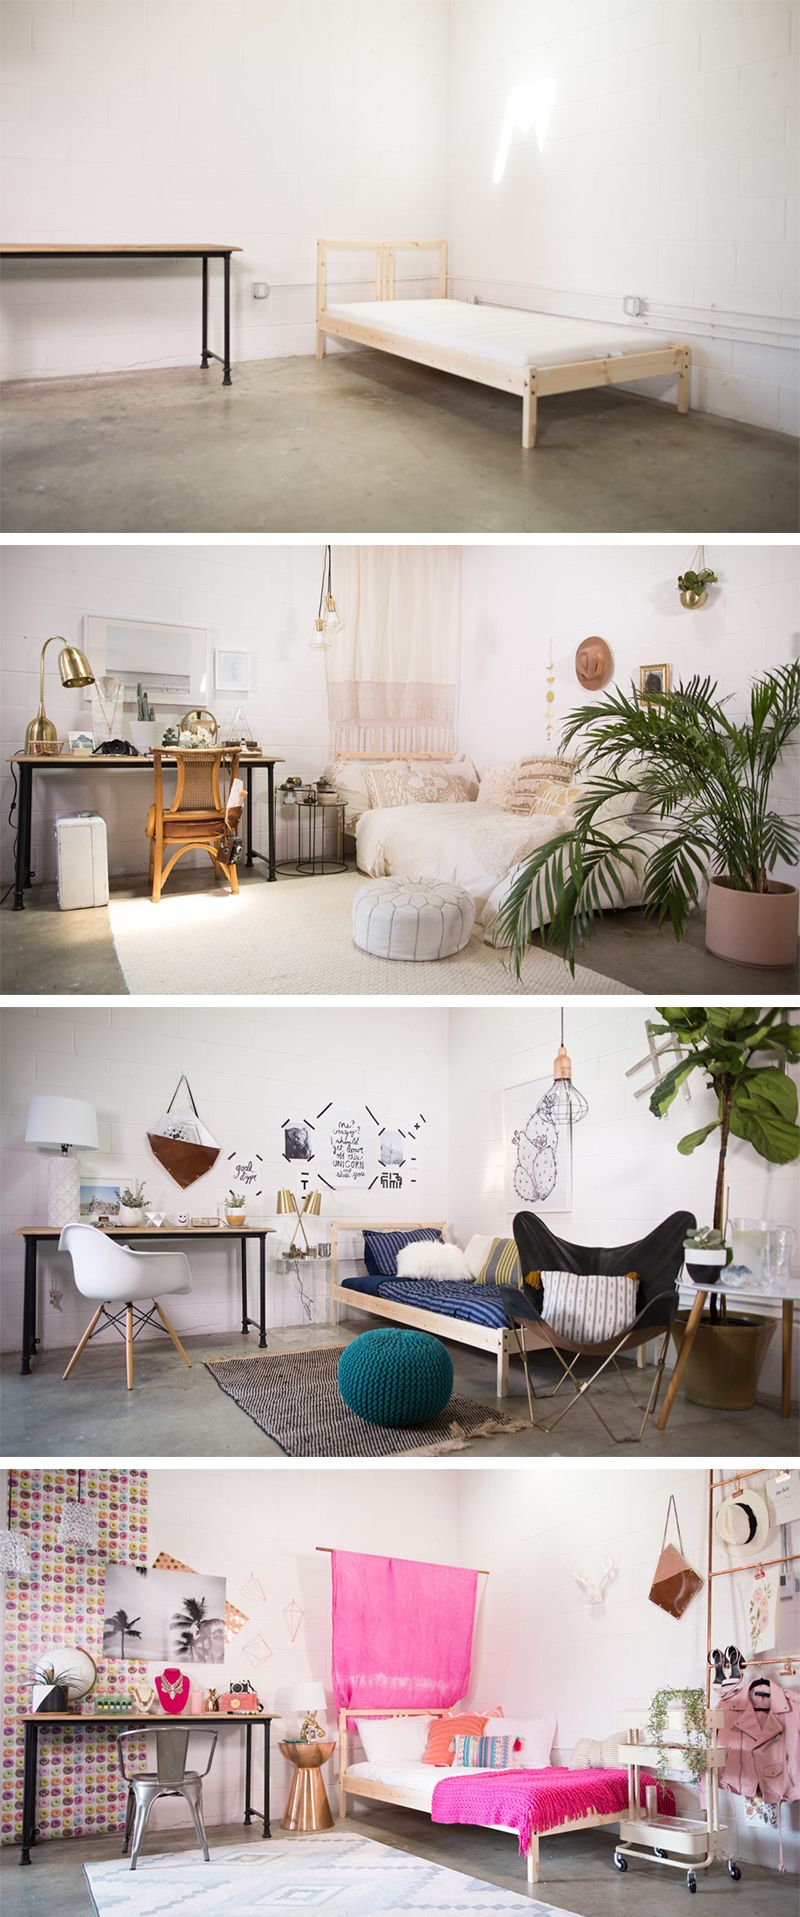 Dorm Room/Small Bedroom Decor, 3 Ways